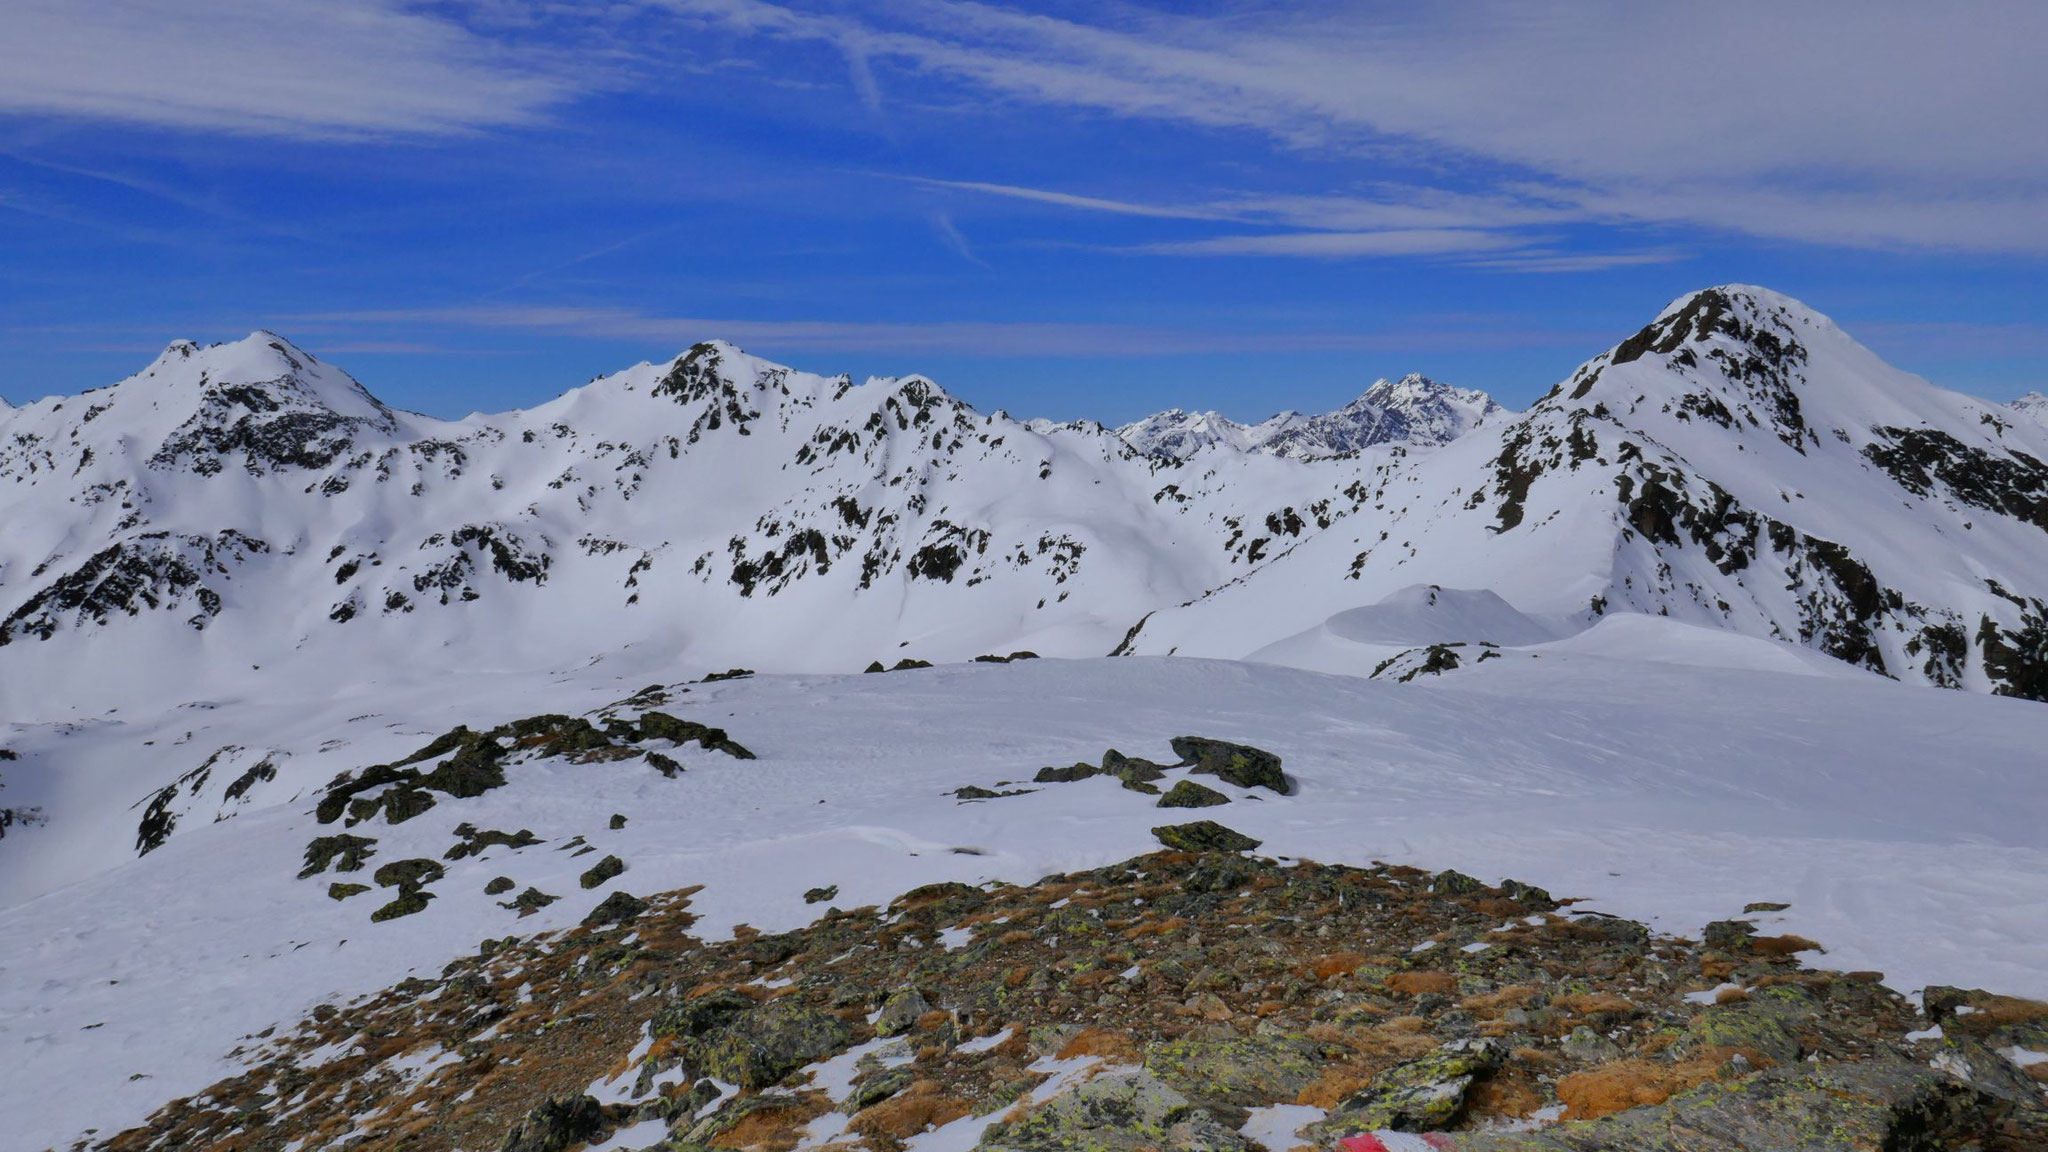 Blankakopf - Glockspitze - Kübelgrubenkopf; am Horizont Hoher Riffler